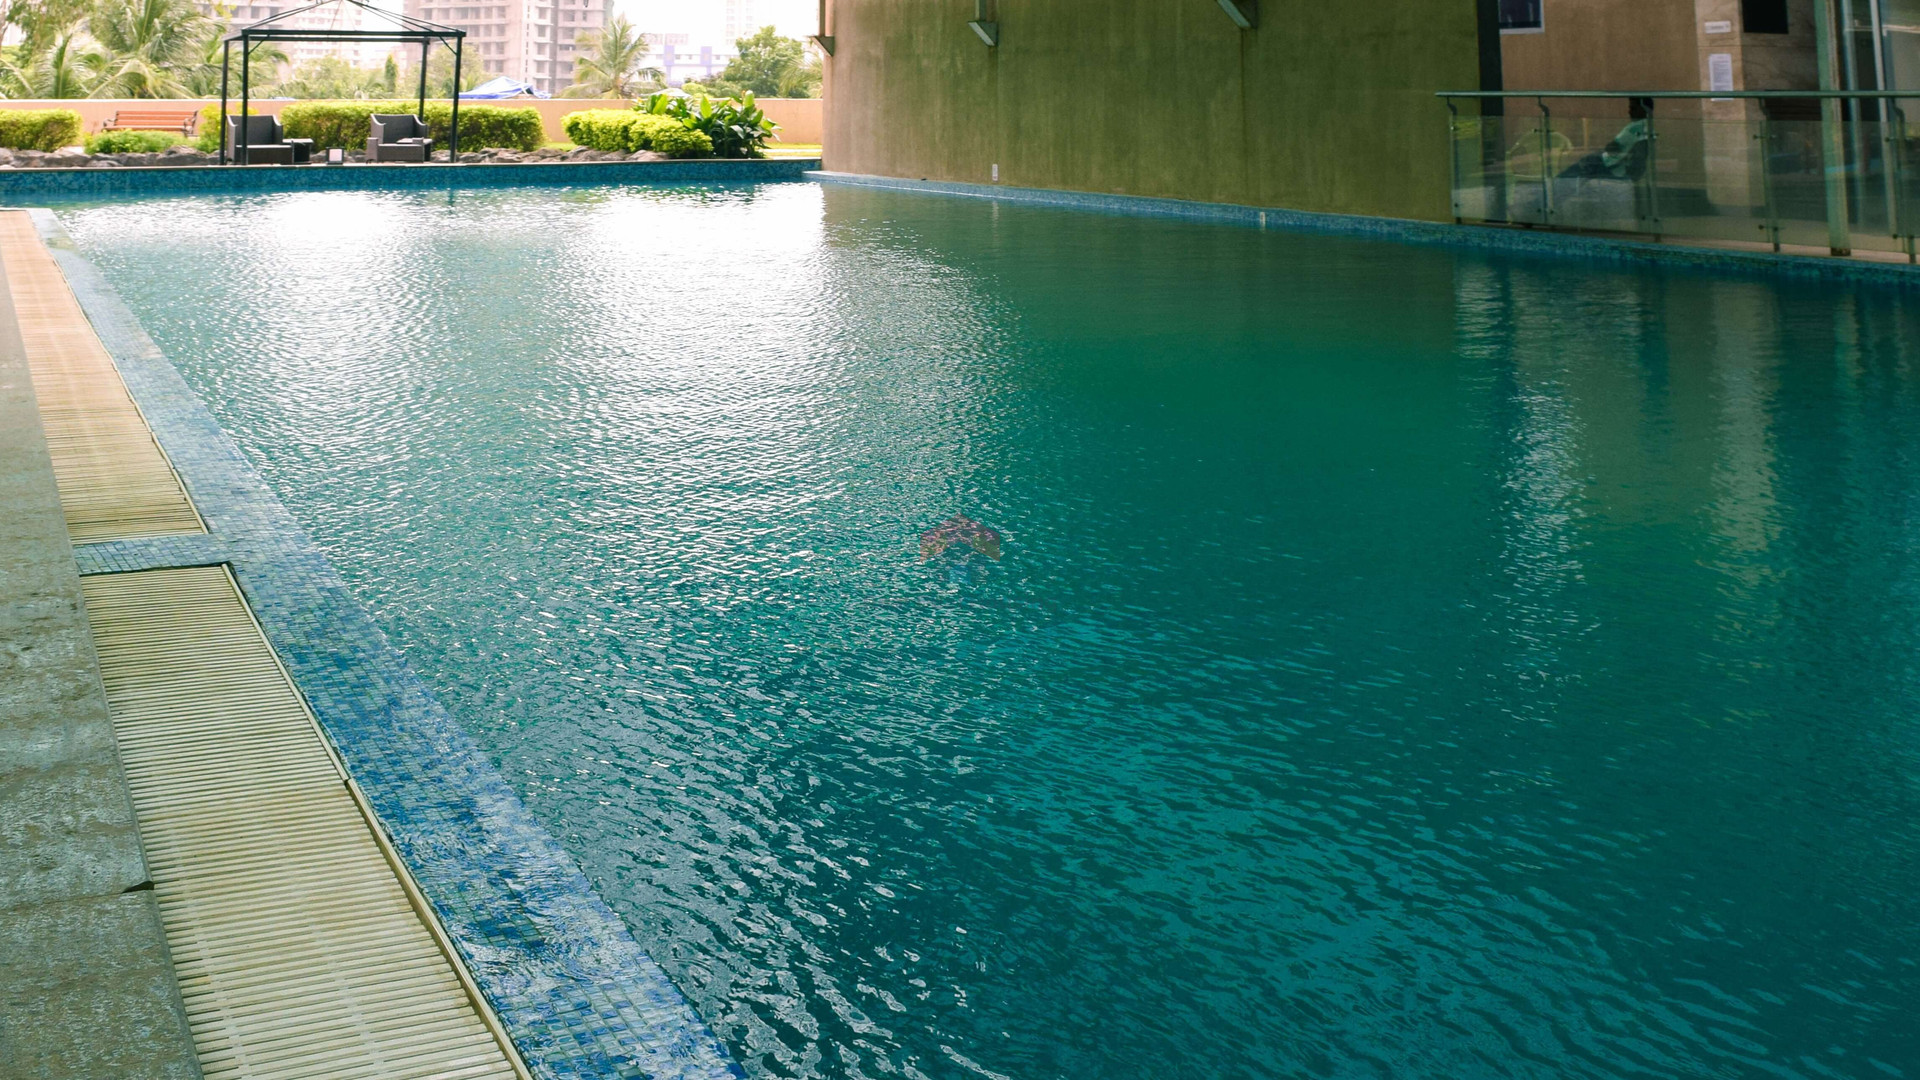 Imperial-heights-swimming-pool.jpg